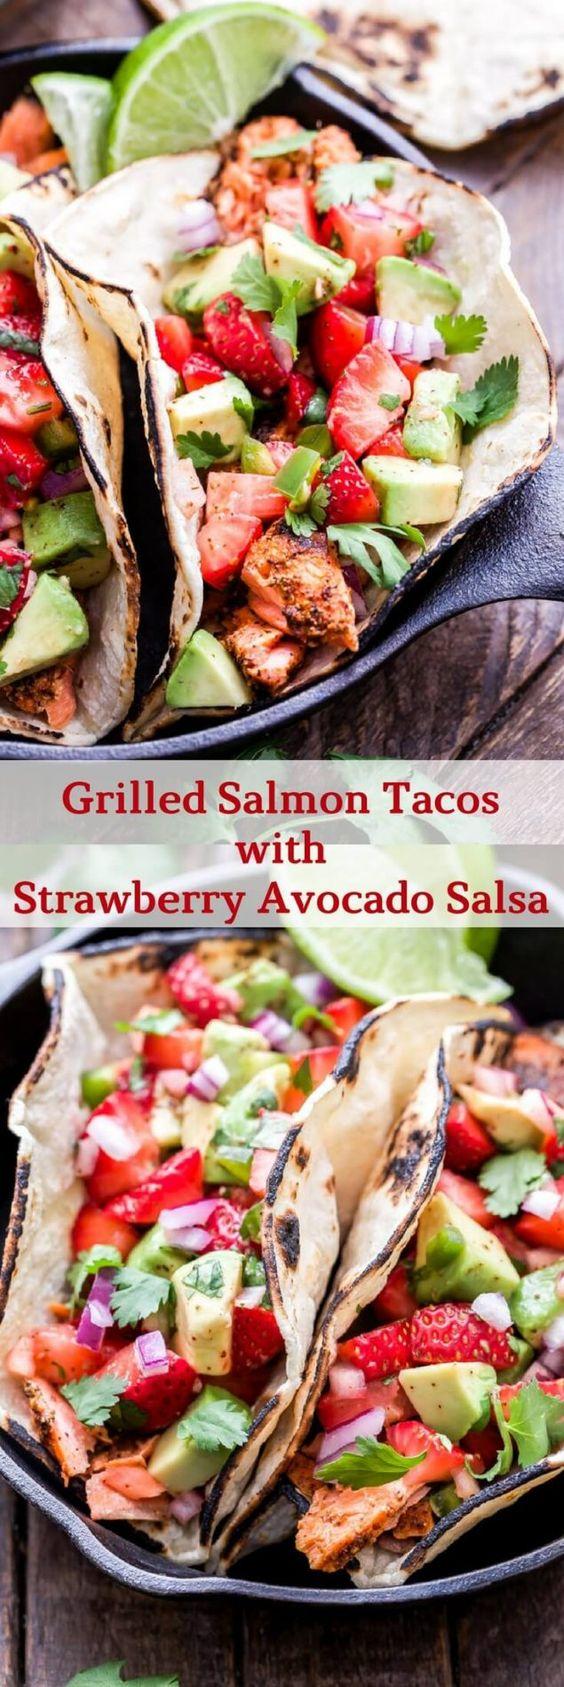 easy taco recipes with salsa